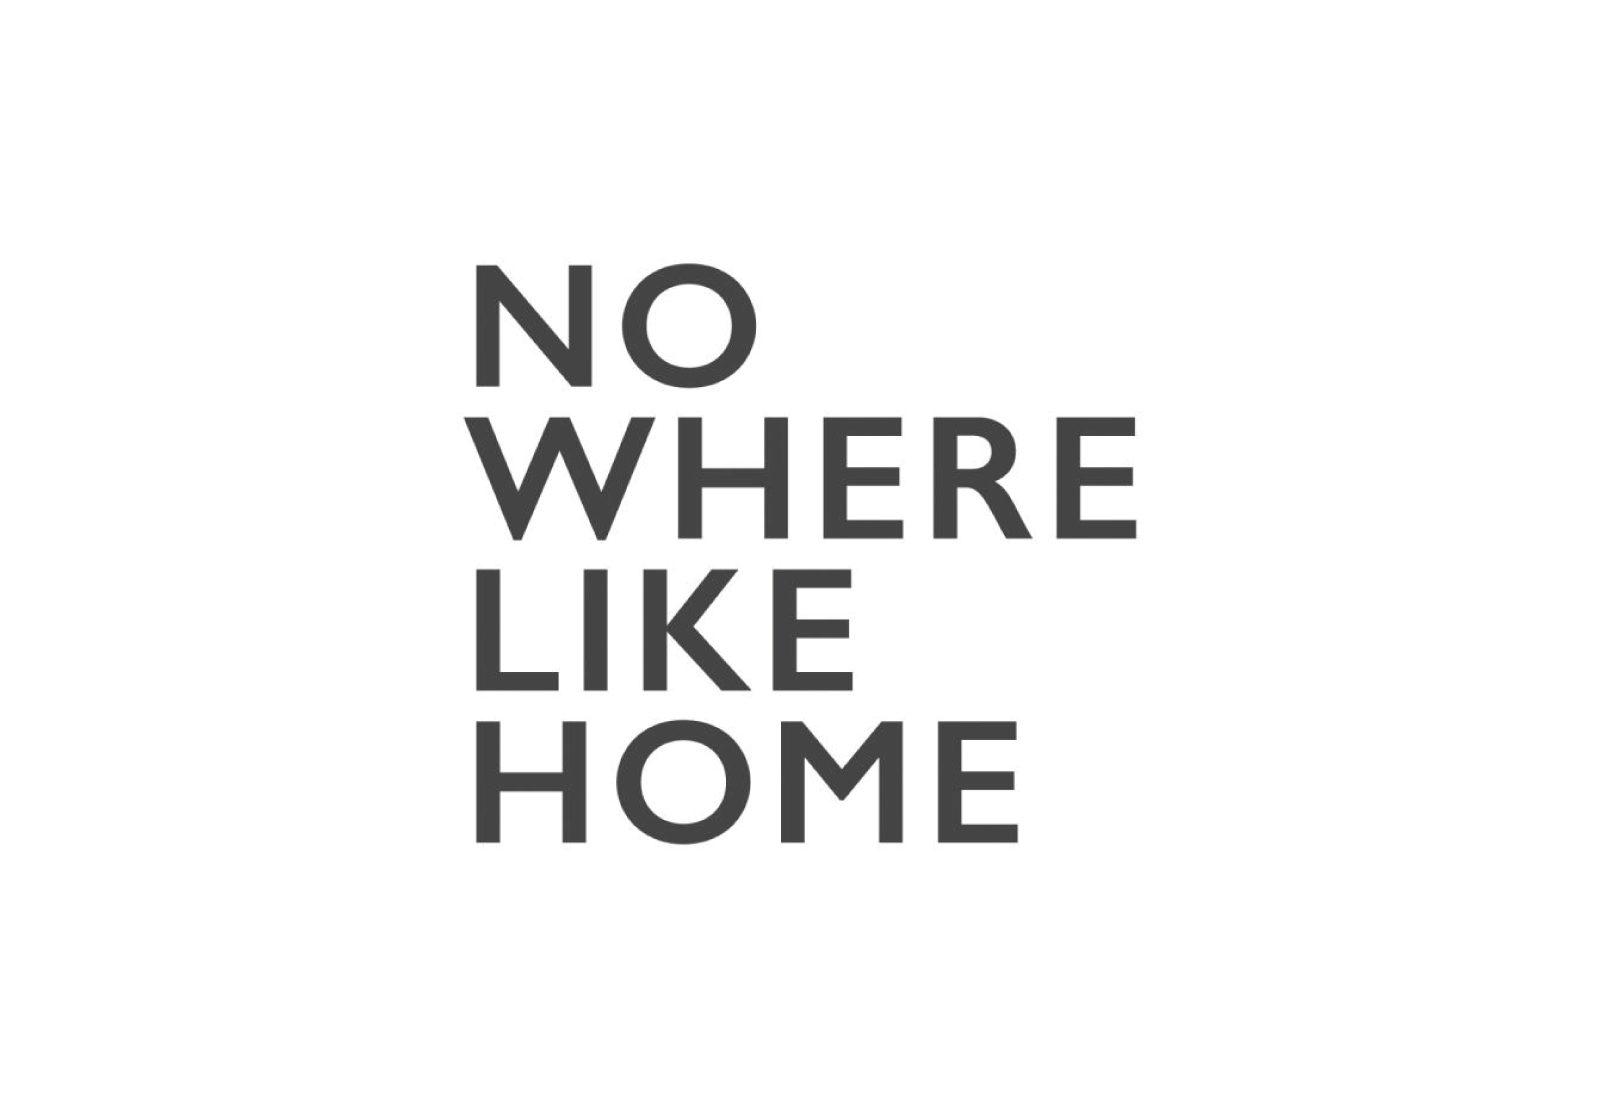 NOWHERE LIKE HOME 商品一覧